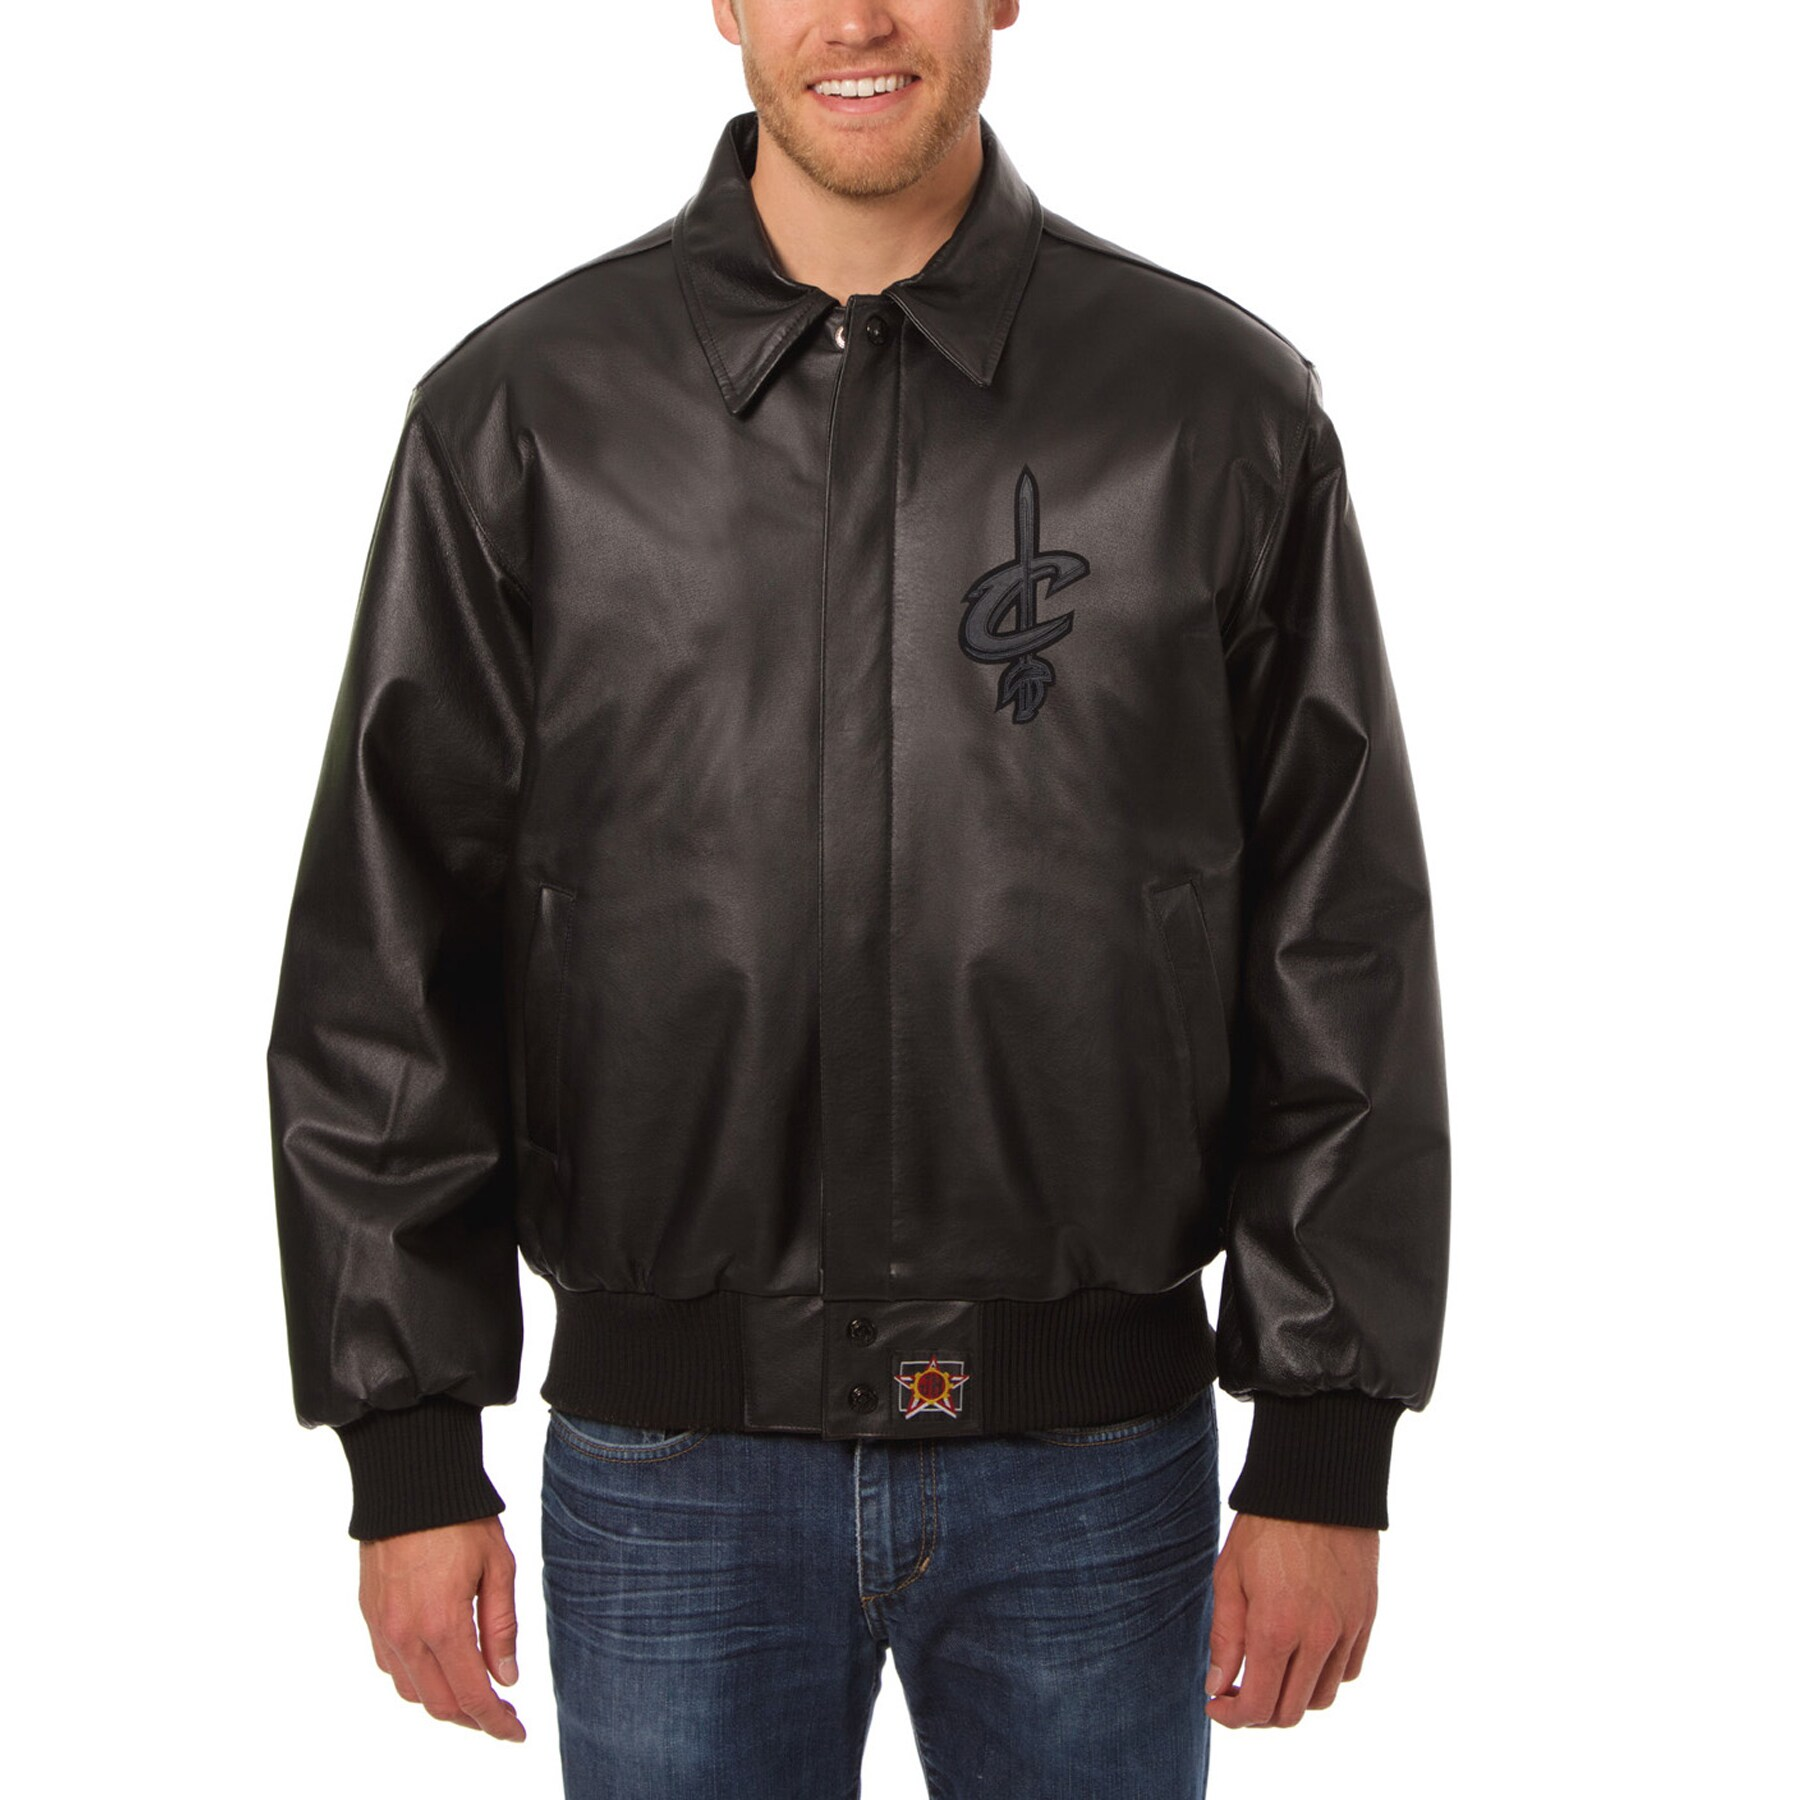 Cleveland Cavaliers JH Design Tonal Leather Full-Zip Jacket - Black